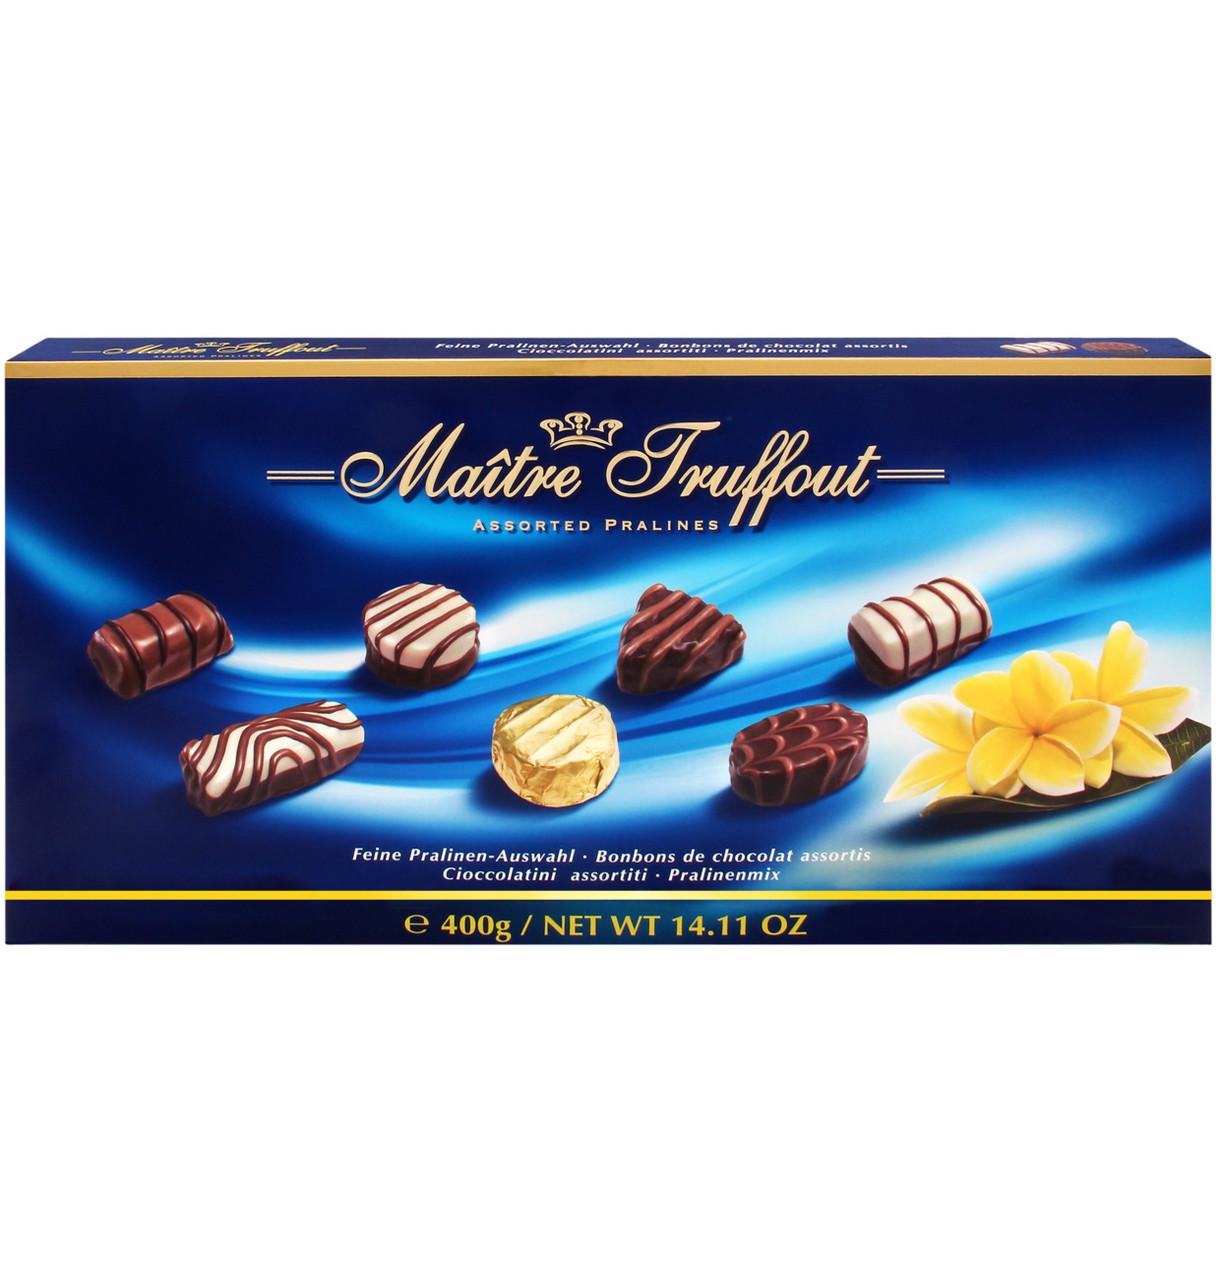 Шоколадные конфеты Maitre Truffout Assorted Pralines с пралине, 400 гр.